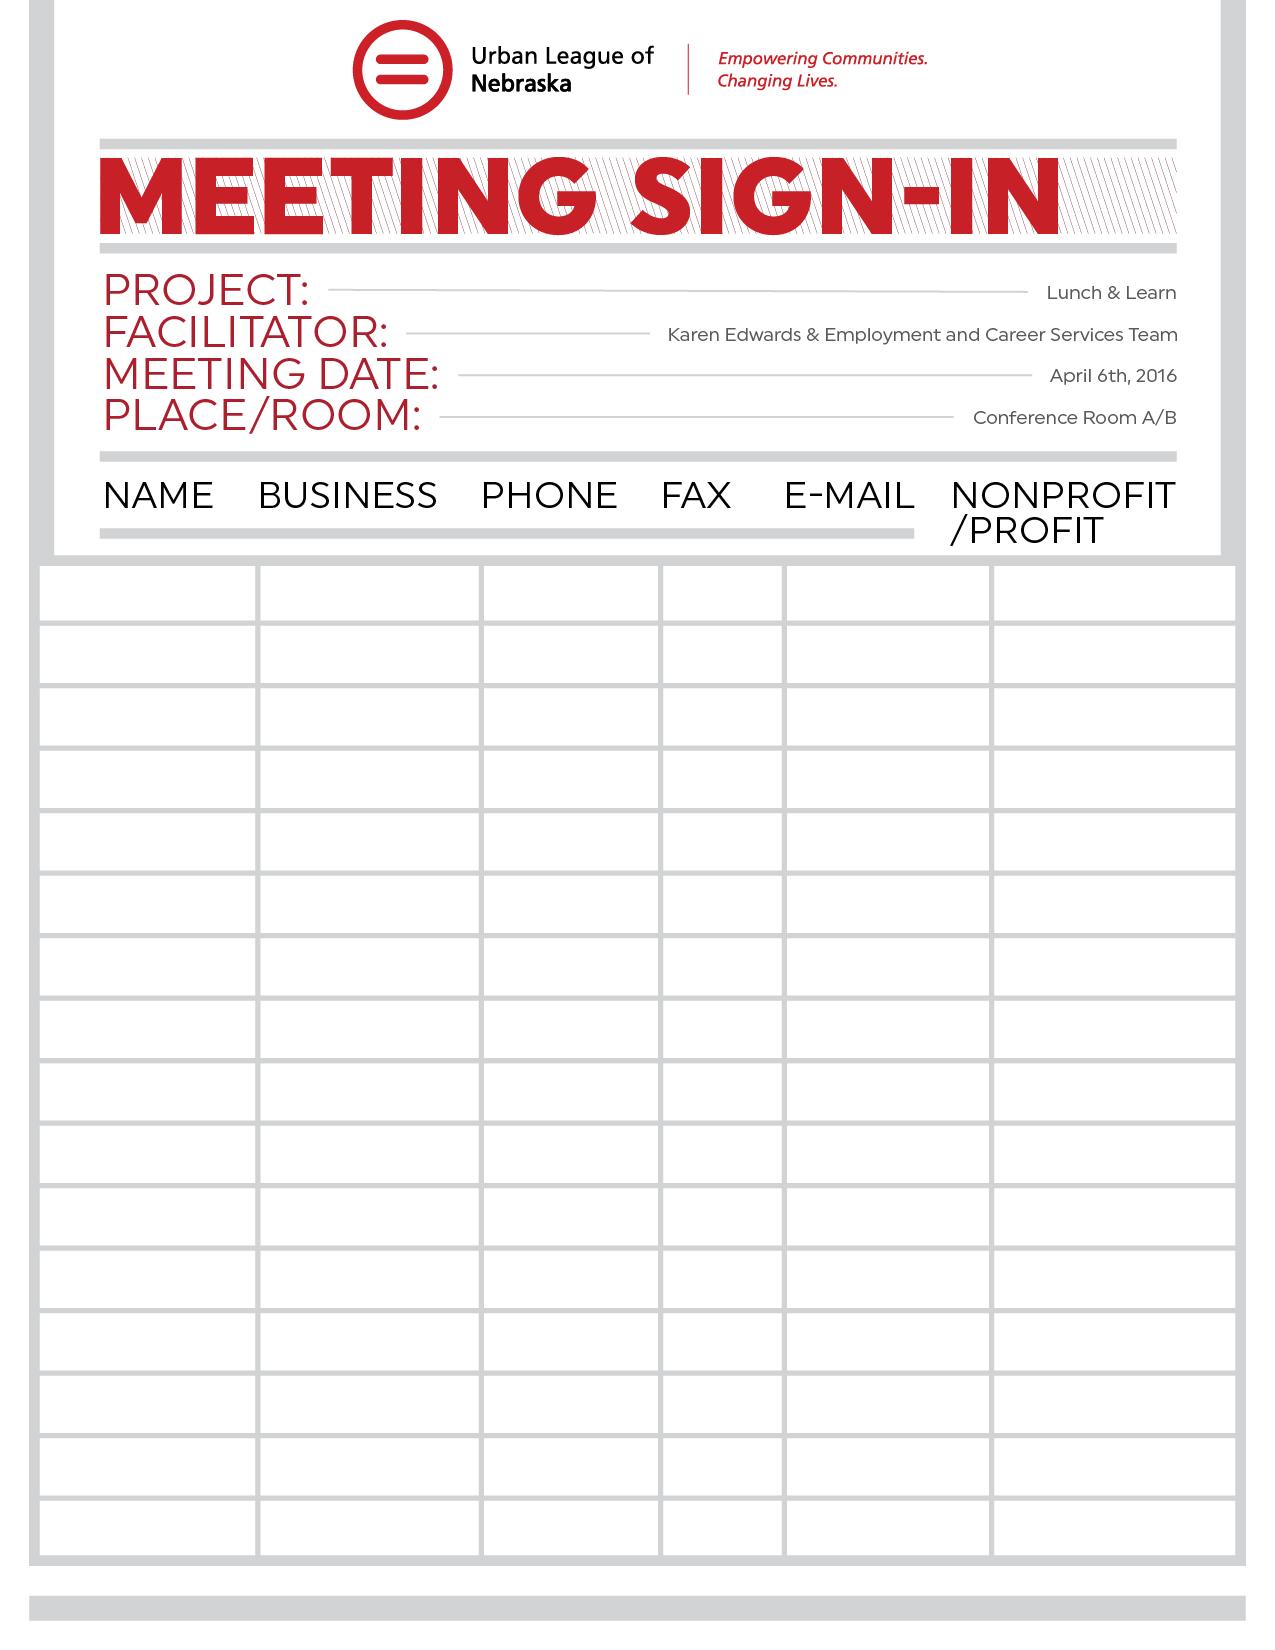 2016 ULN Meeting Sign-In Web-01.jpg